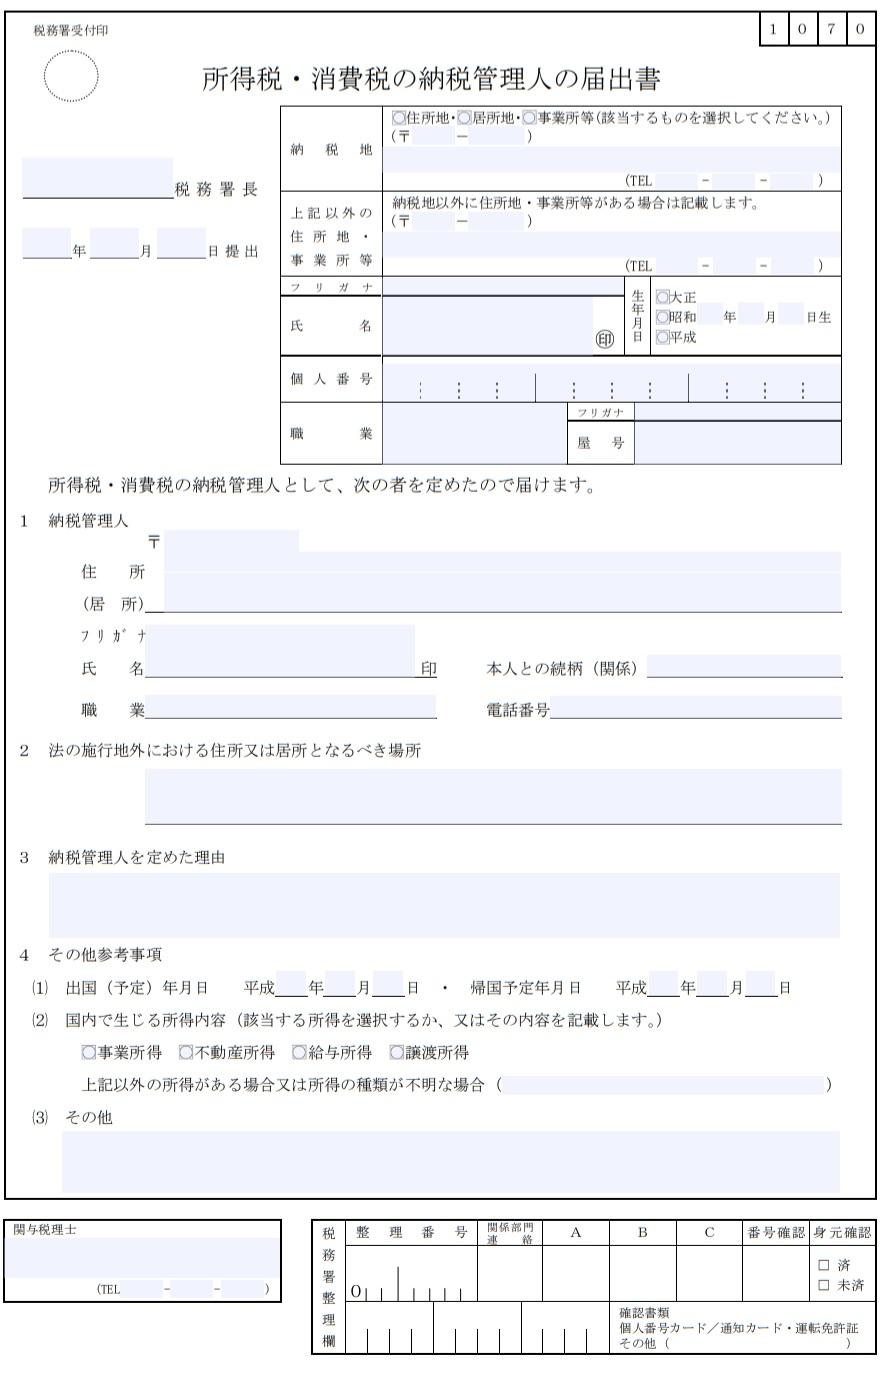 所得税・消費税の納税管理人の届出書 見本